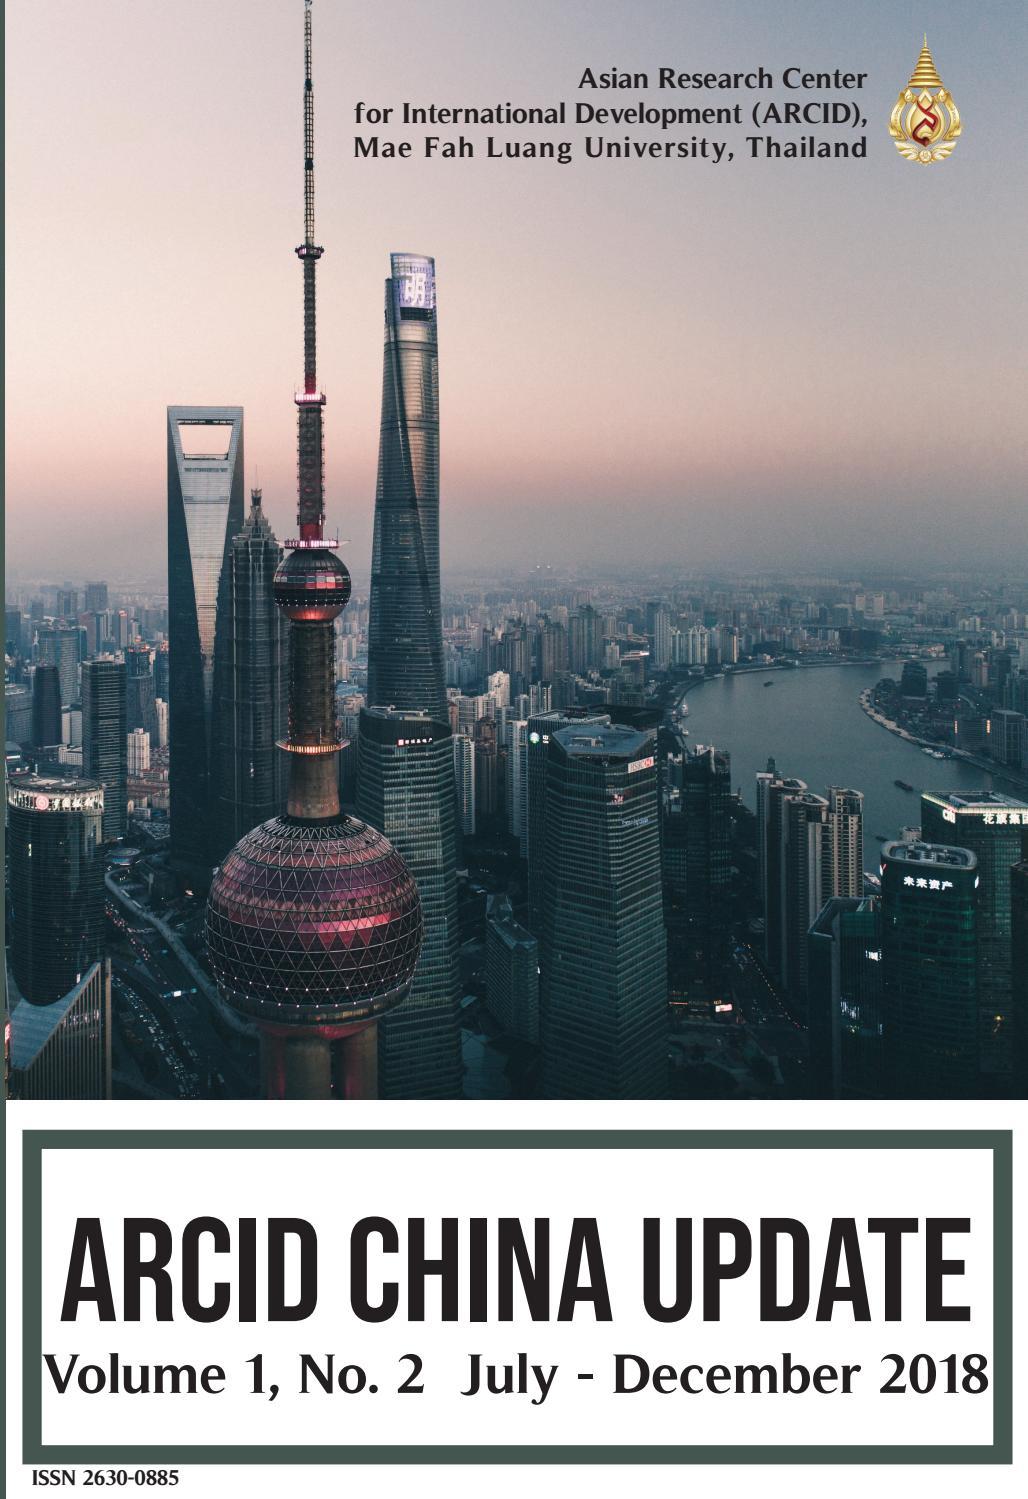 ARCID China Update Volume 1, No  2 by Mae Fah Luang University - issuu